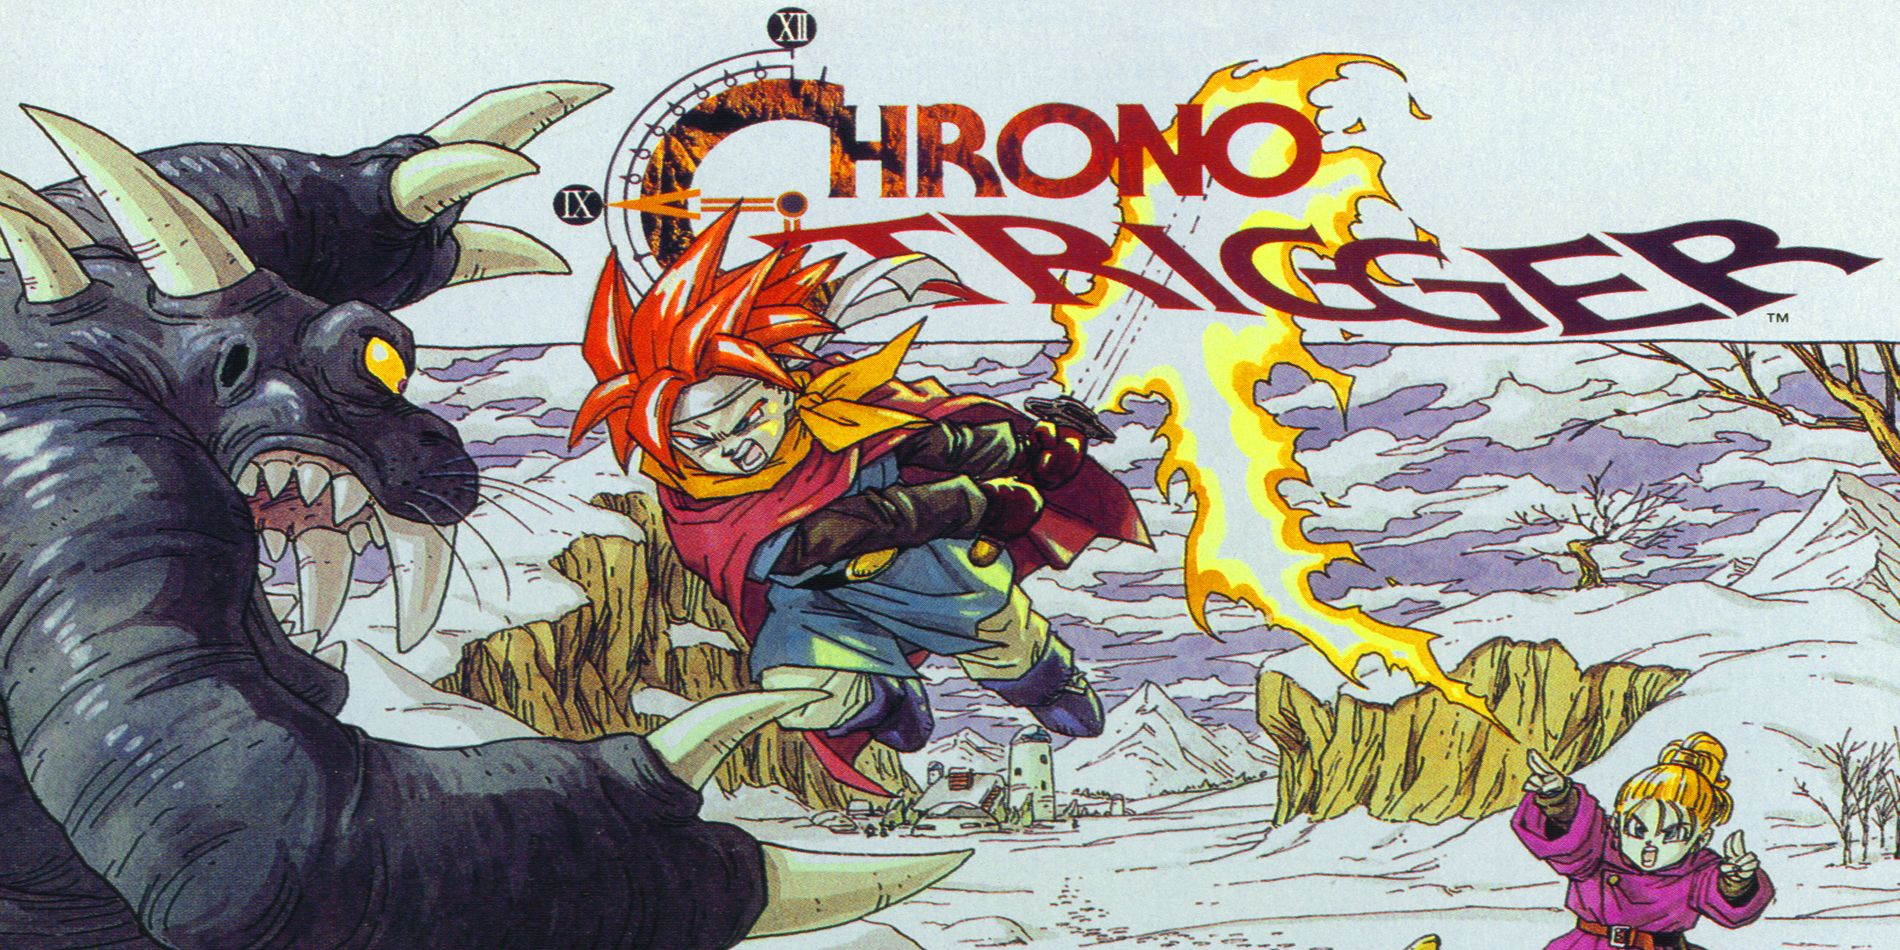 Chrono cross feeding dragons prizes for students